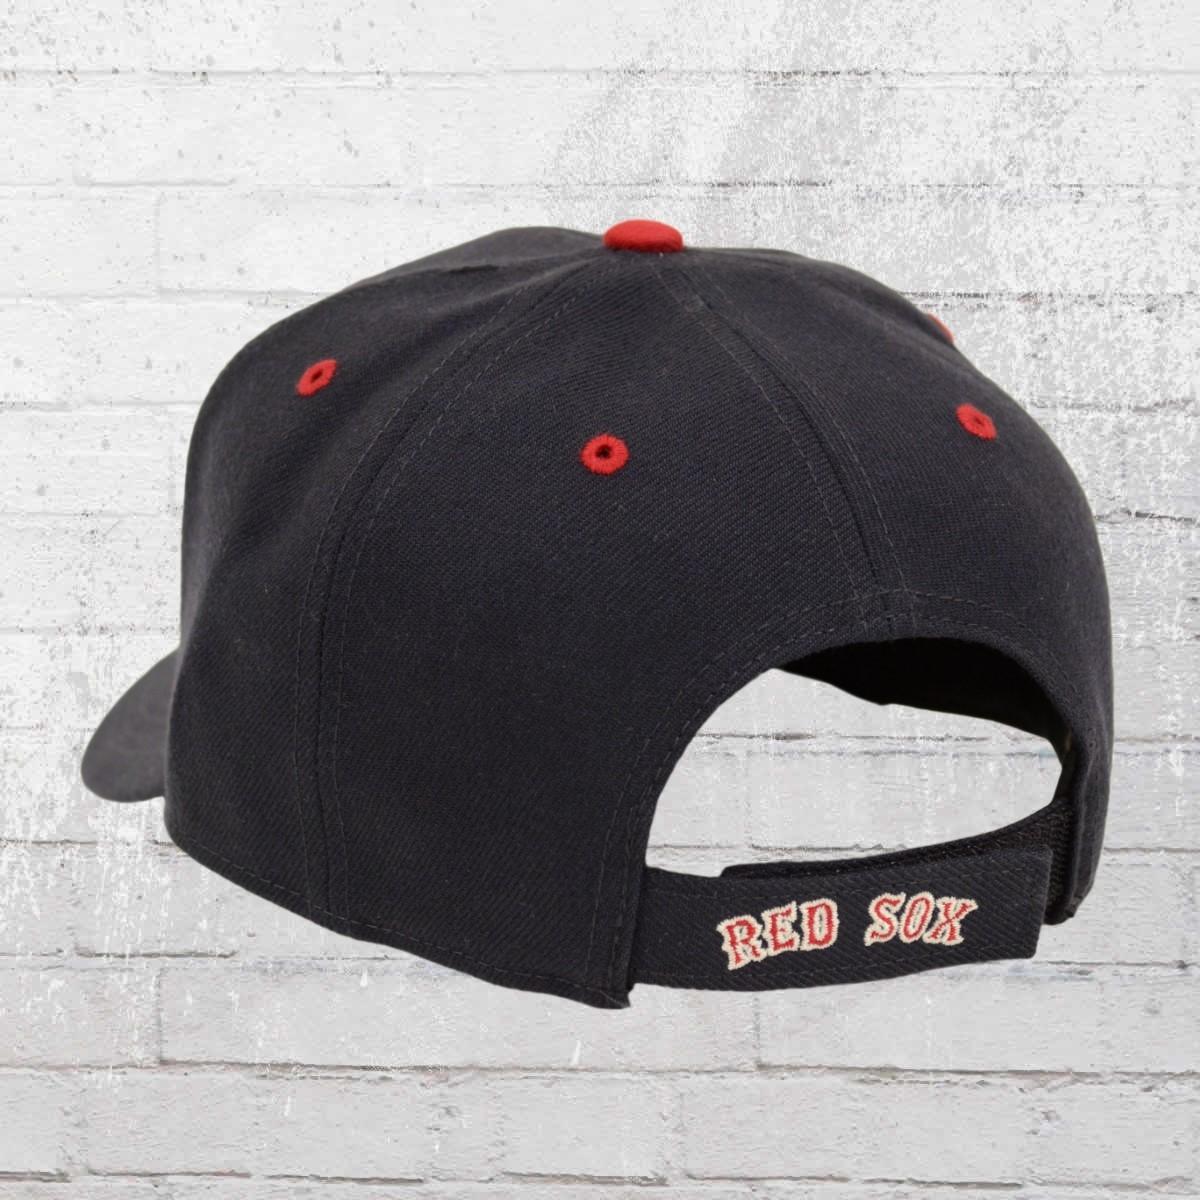 9b64e73ecc17c 47 Brand Baseball Hat MLB LA Dodgers Snapback Cap grey multi 19,99 €